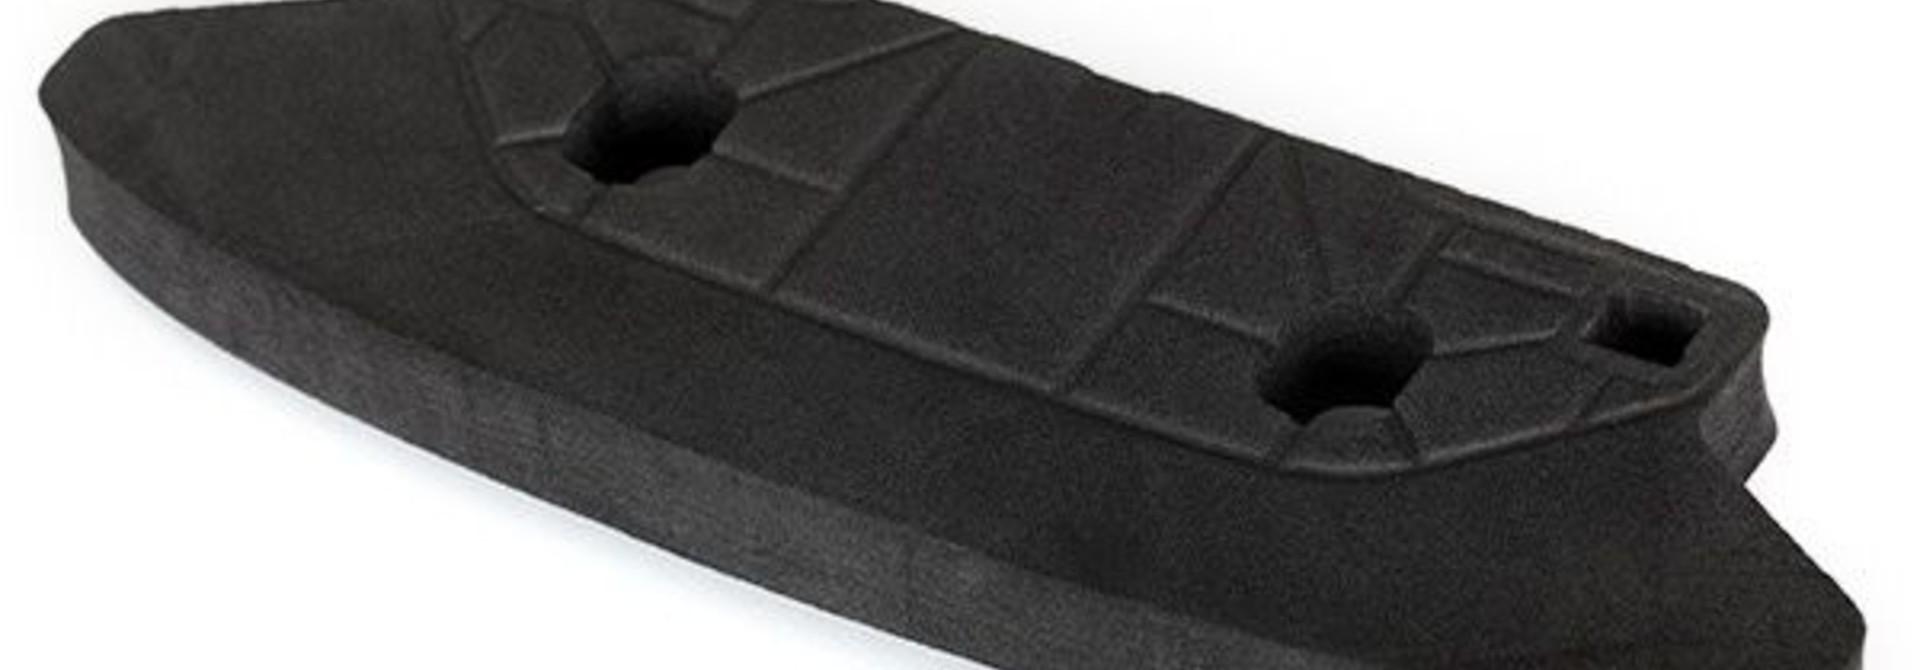 Body bumper, foam (low profile) (use with #7435 front skidpl, TRX7434